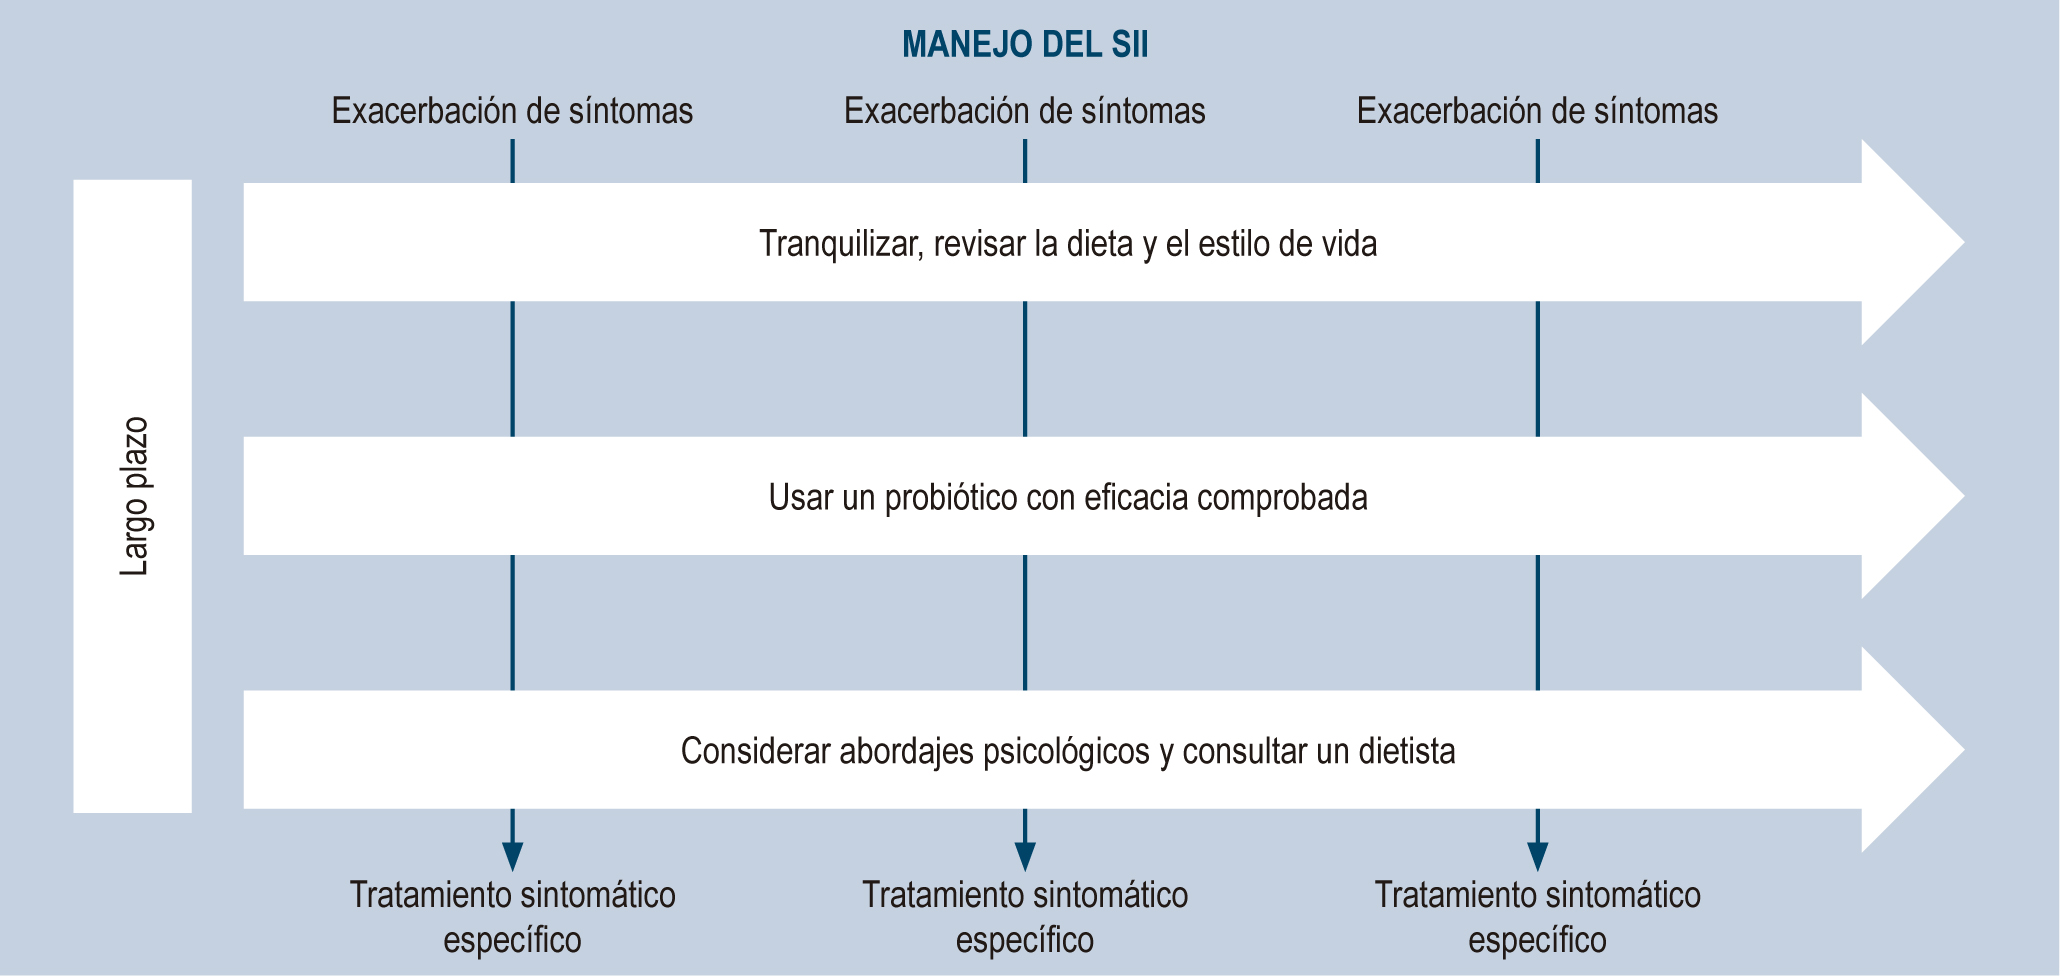 Figura 1. Manejo del SII. SII: síndrome de intestino irritable.